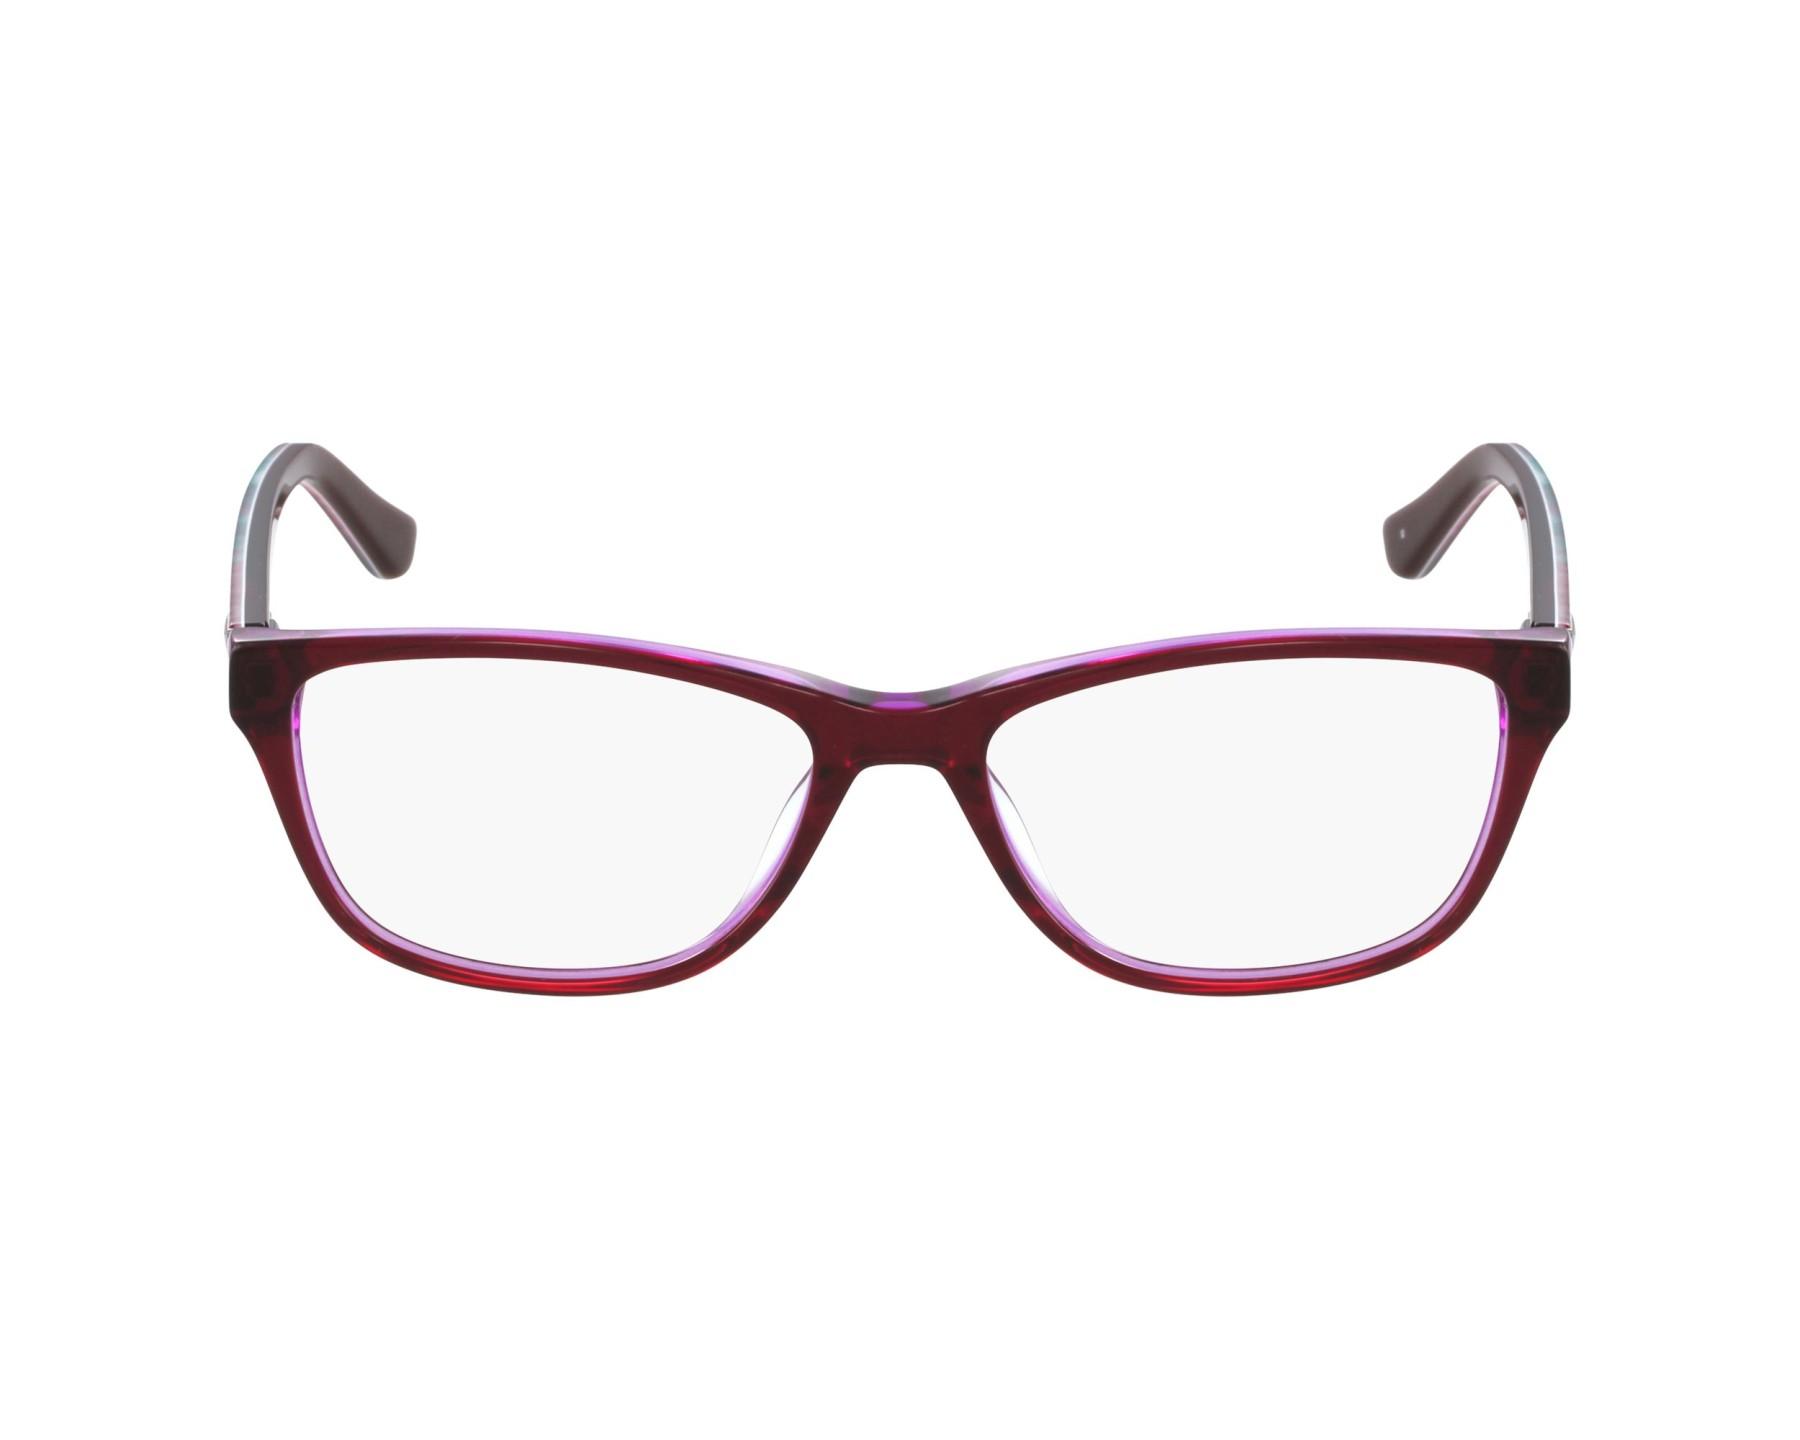 Guess Eyeglasses GU-2513 066 Bordeaux   visio-net.com